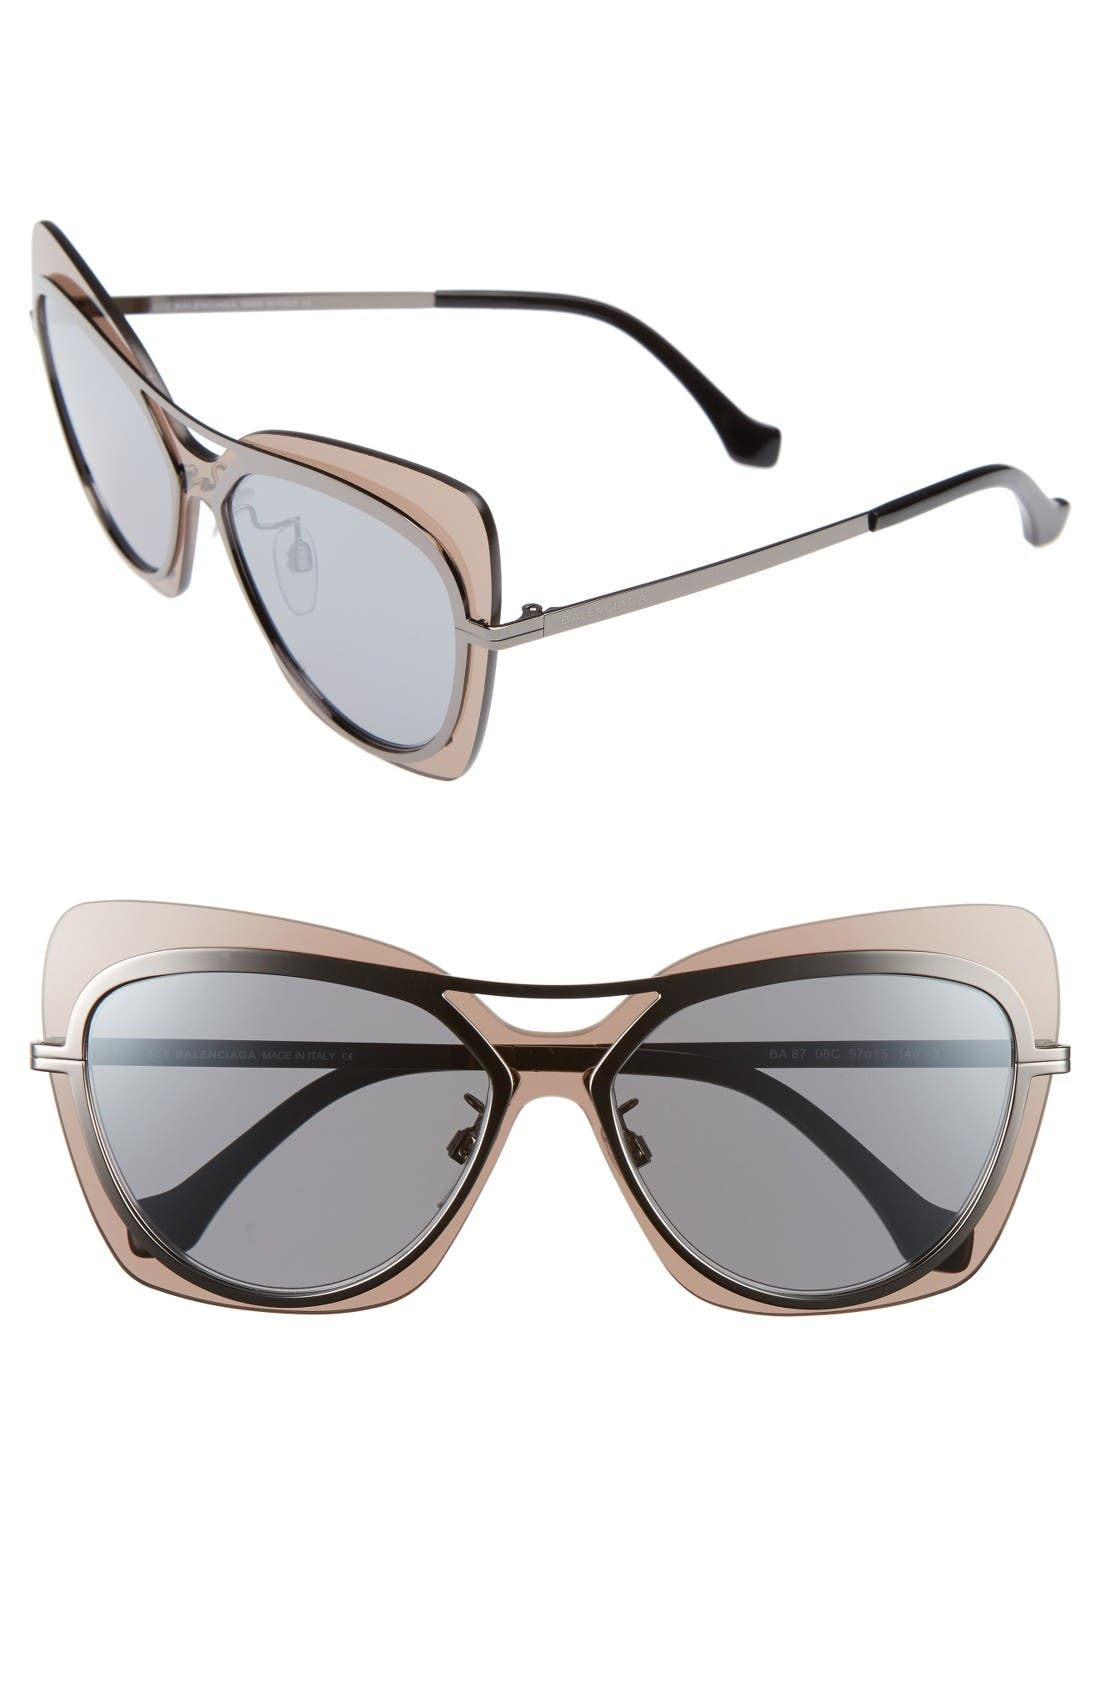 Balenciaga 57mm Layered Butterfly Sunglasses